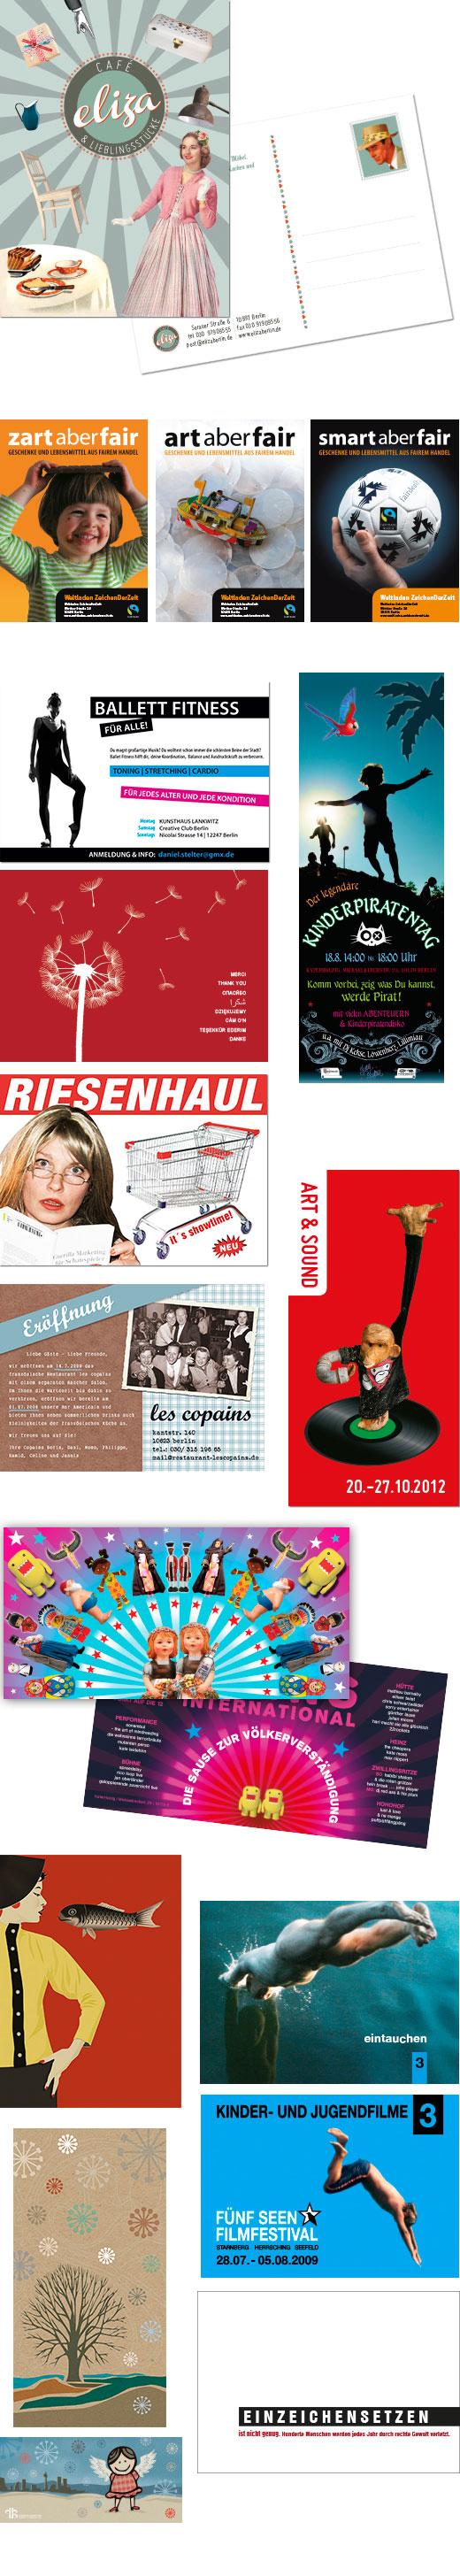 Postkarten/flyer